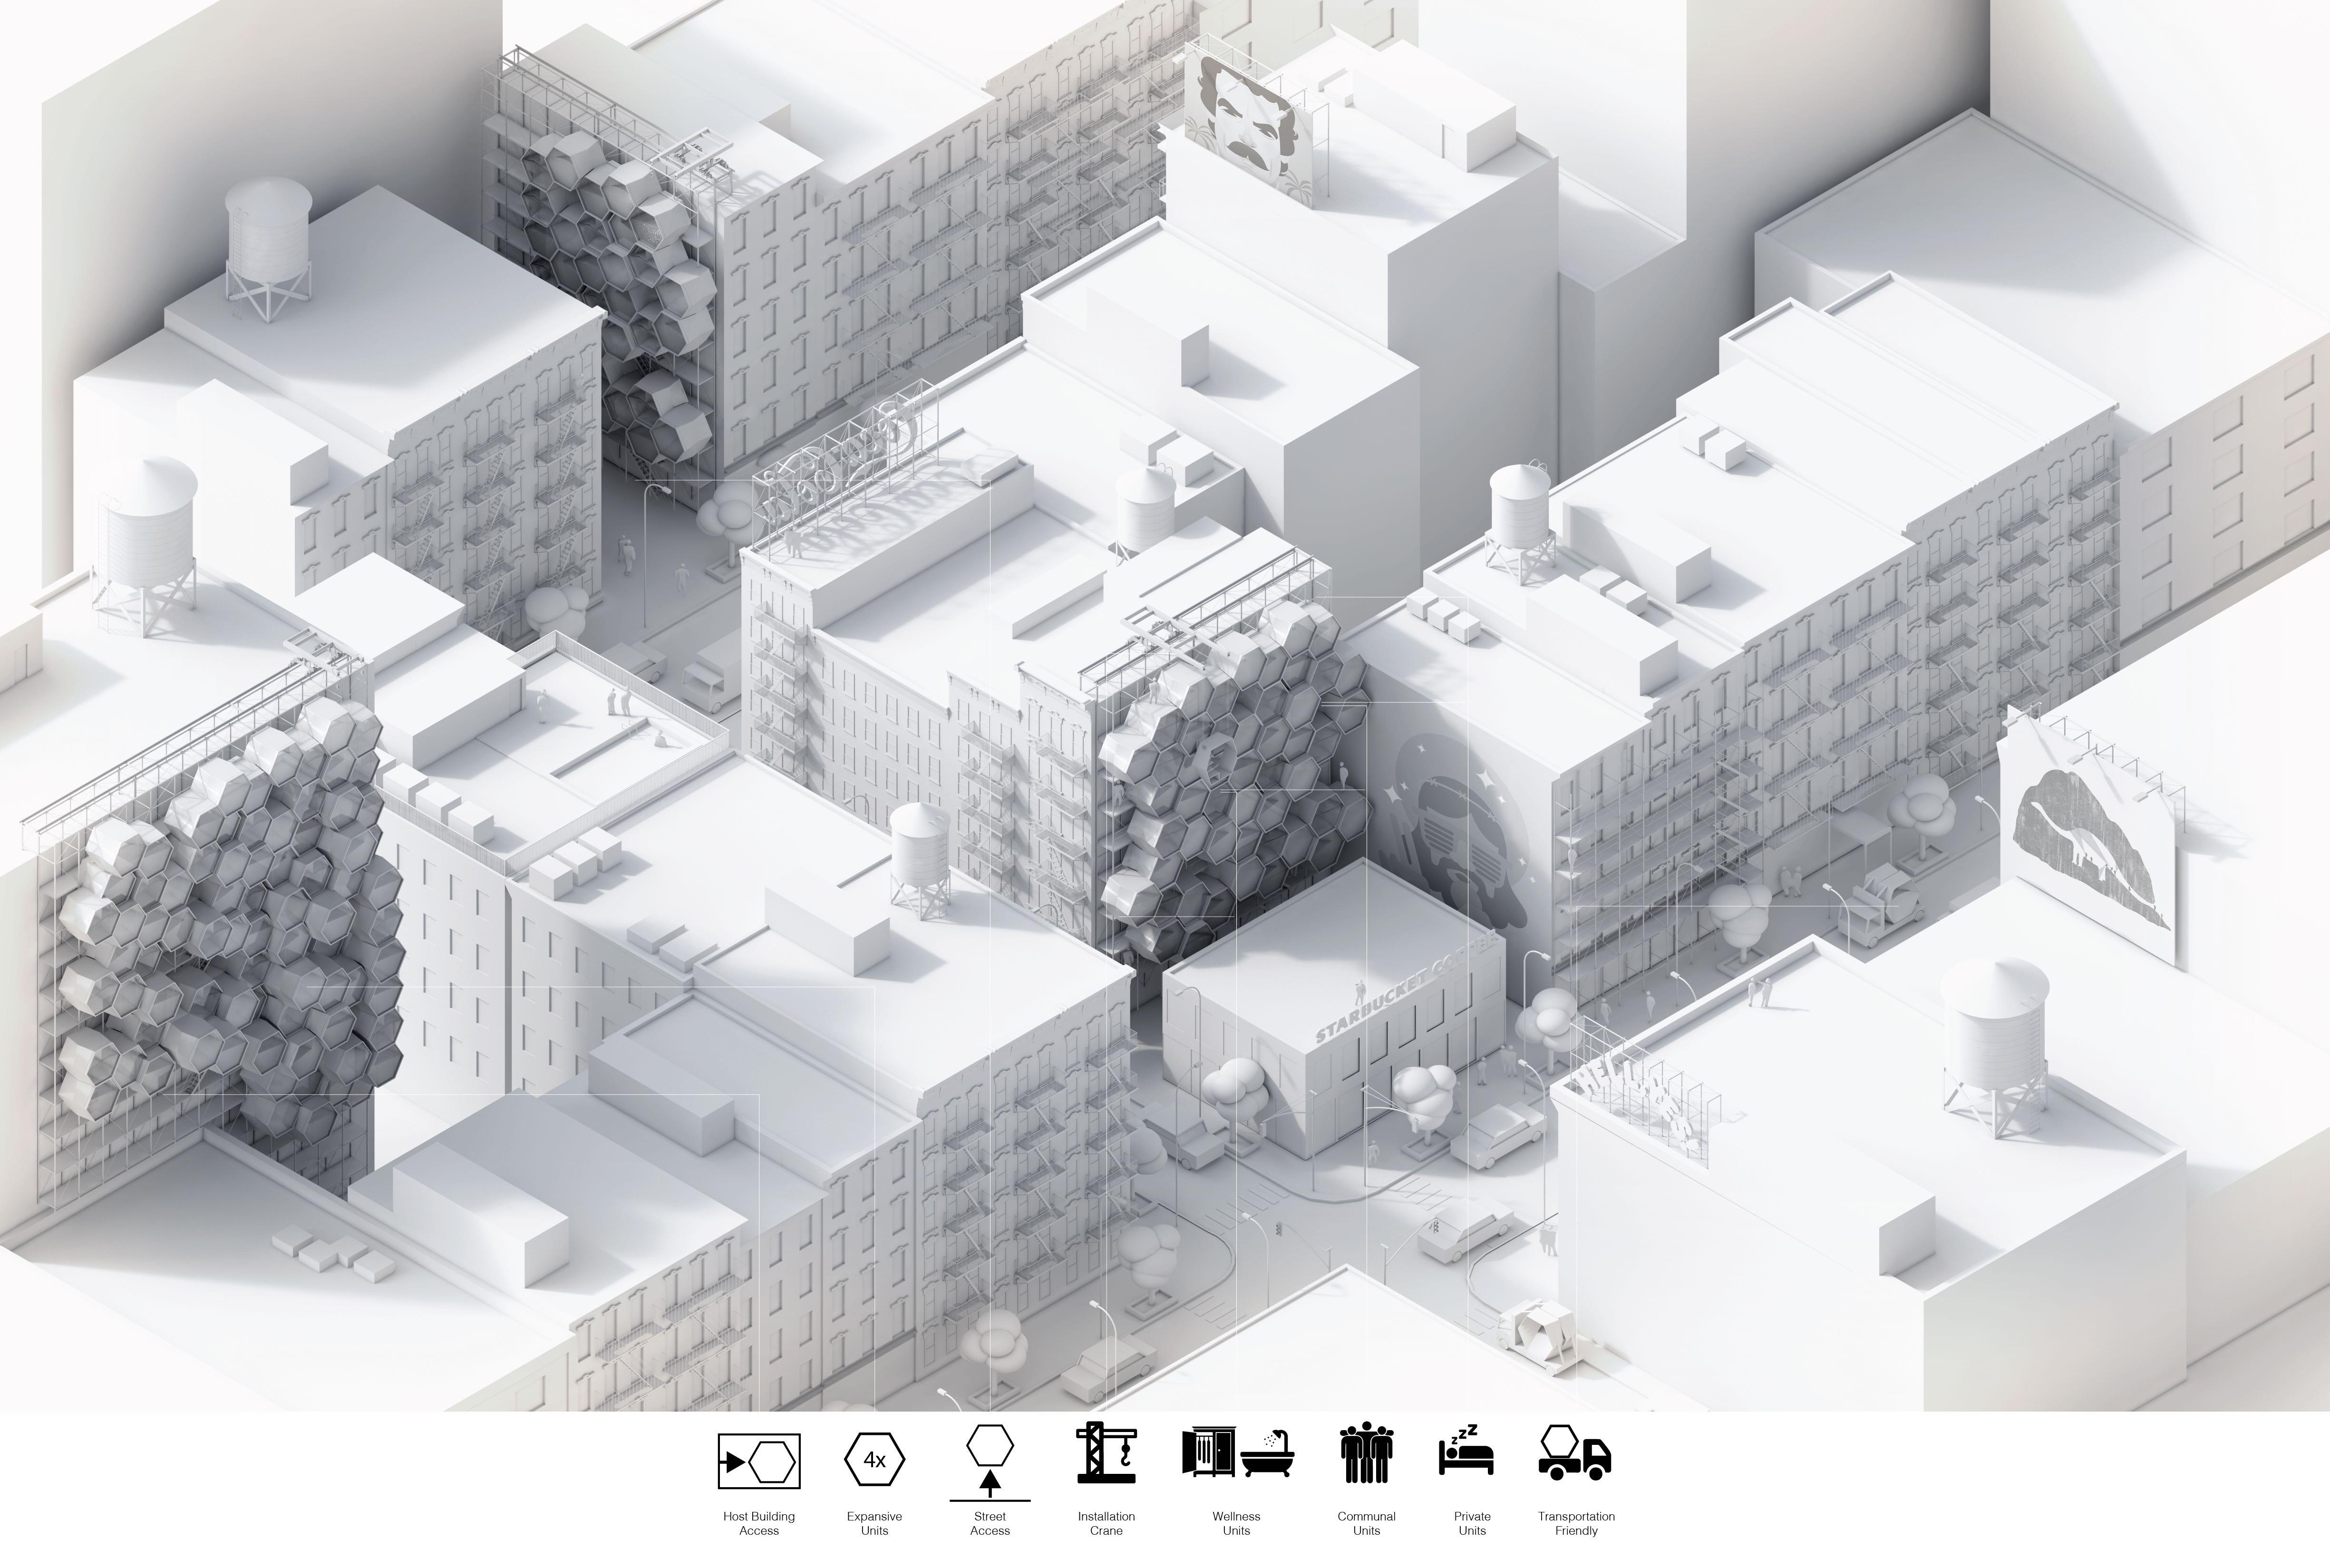 framlab homed apartments homeless new york city